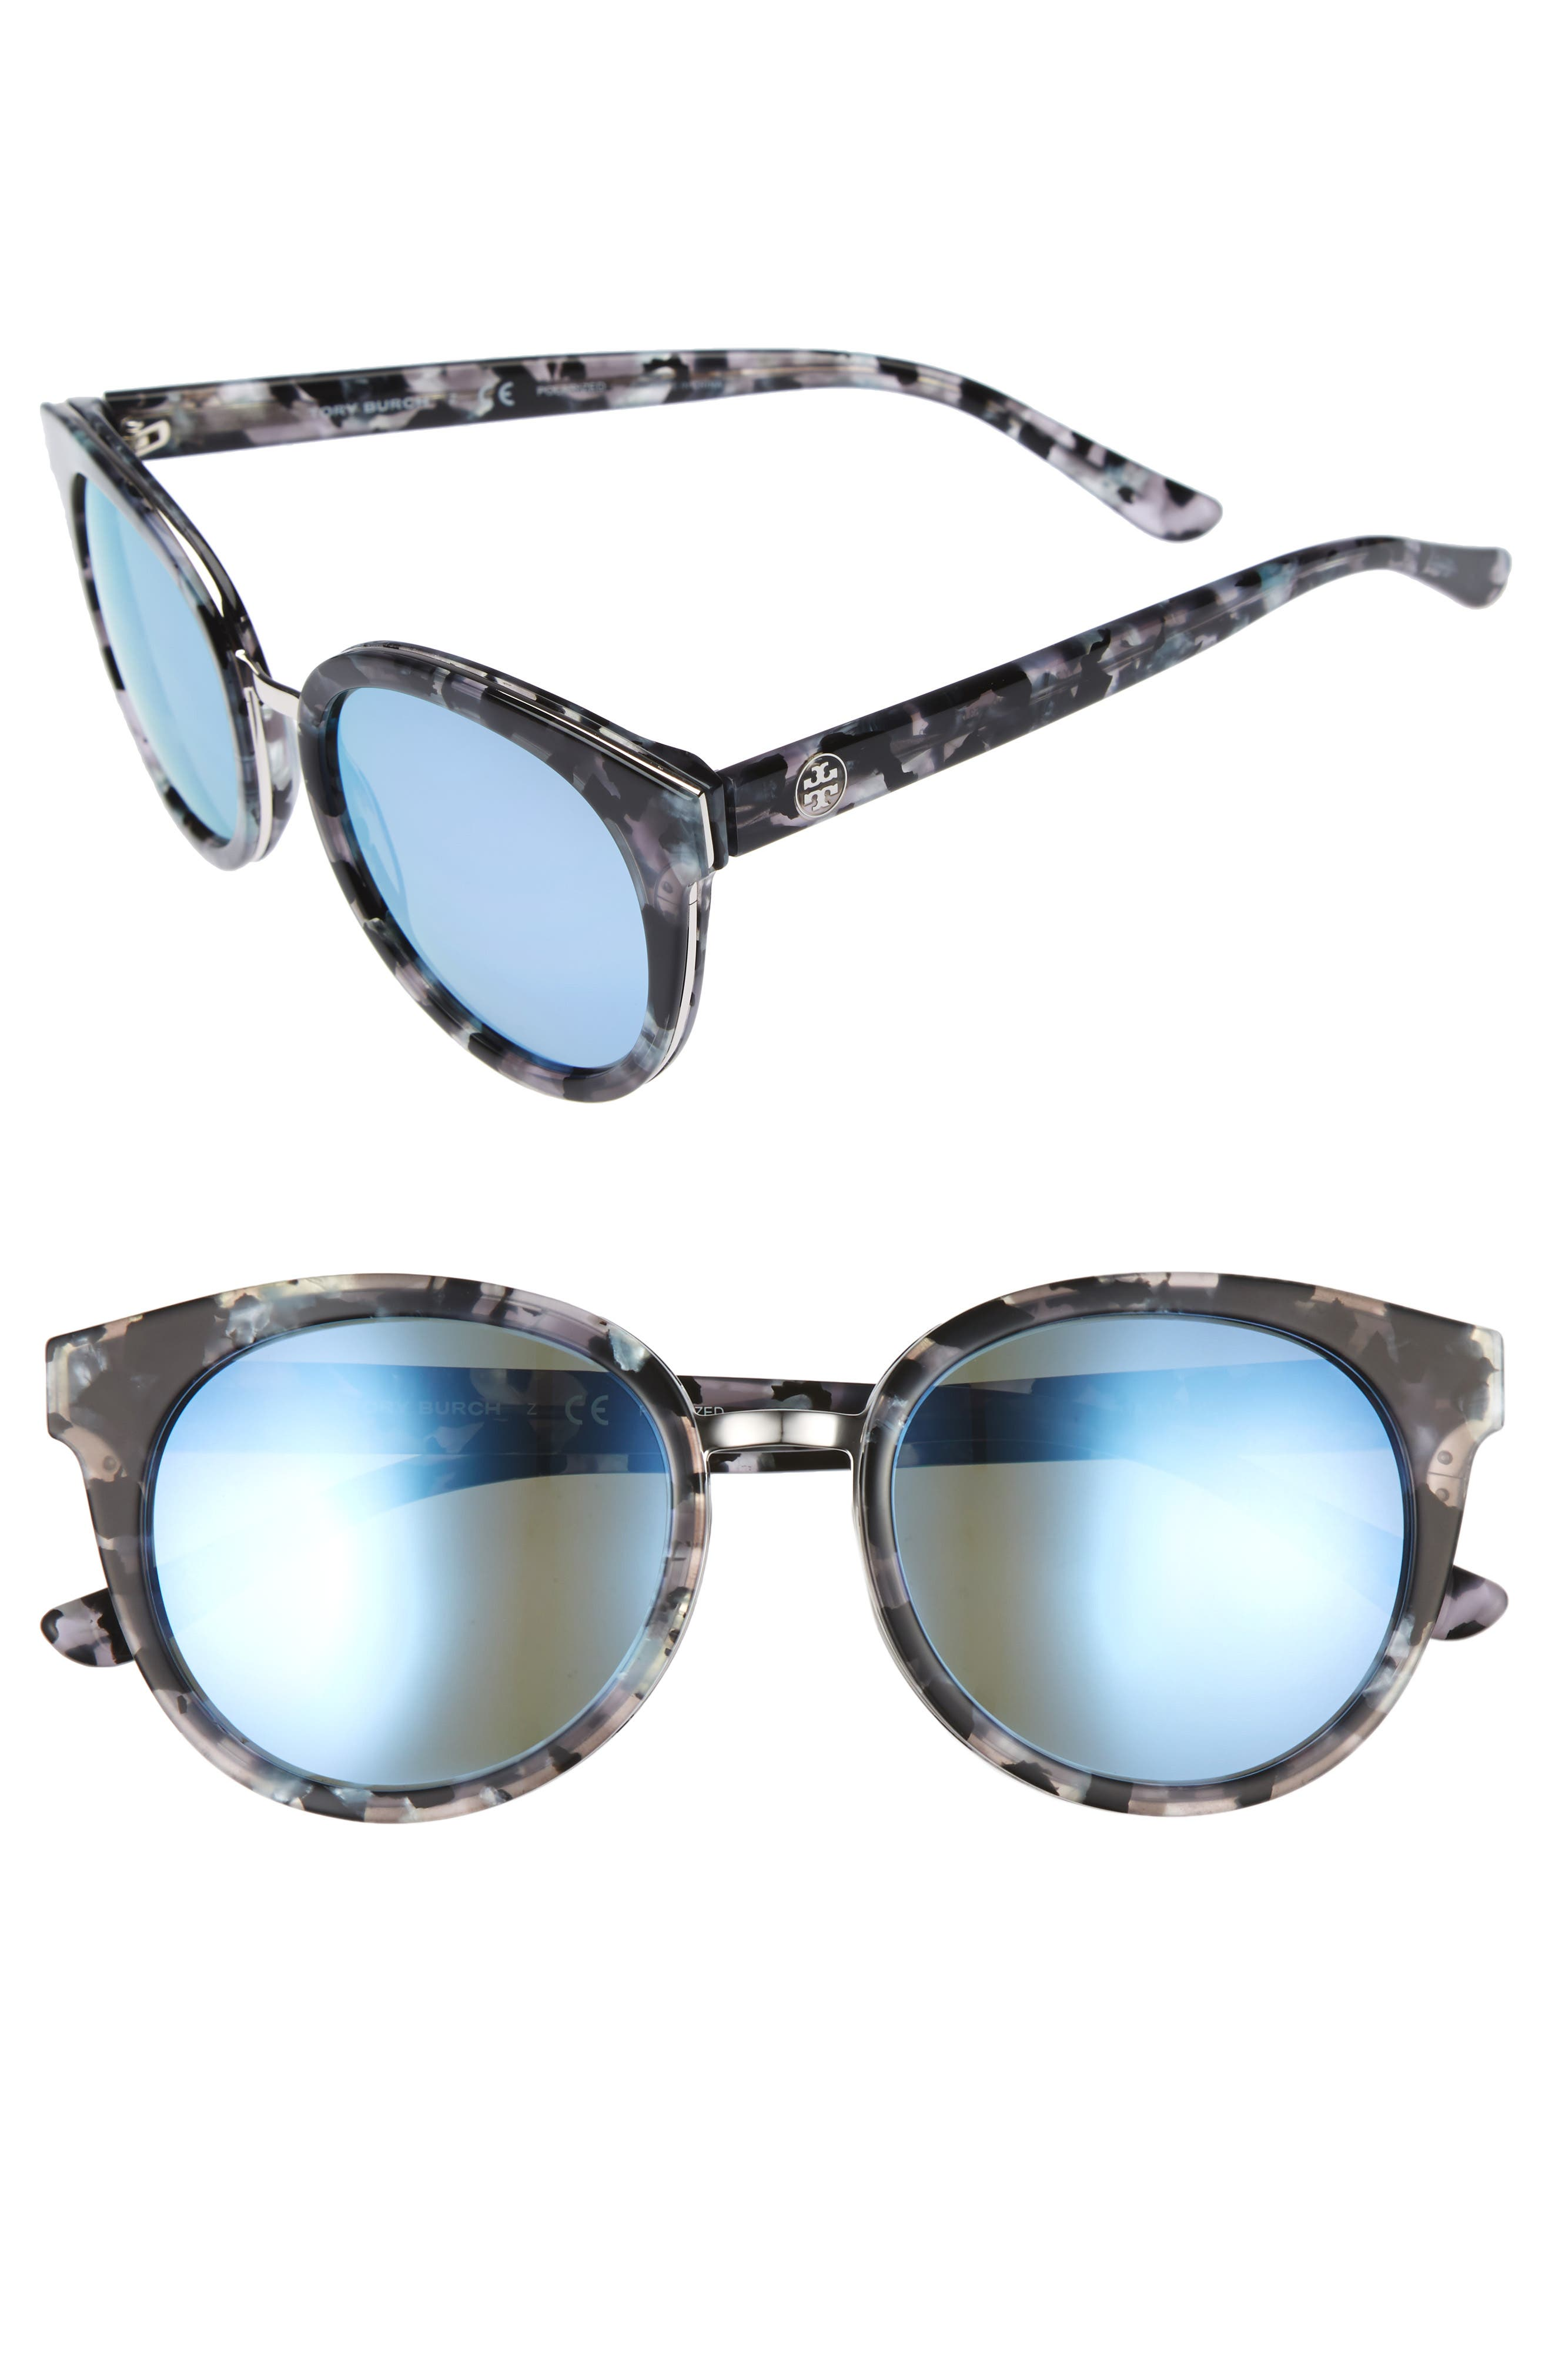 Main Image - Tory Burch 53mm Polarized Sunglasses